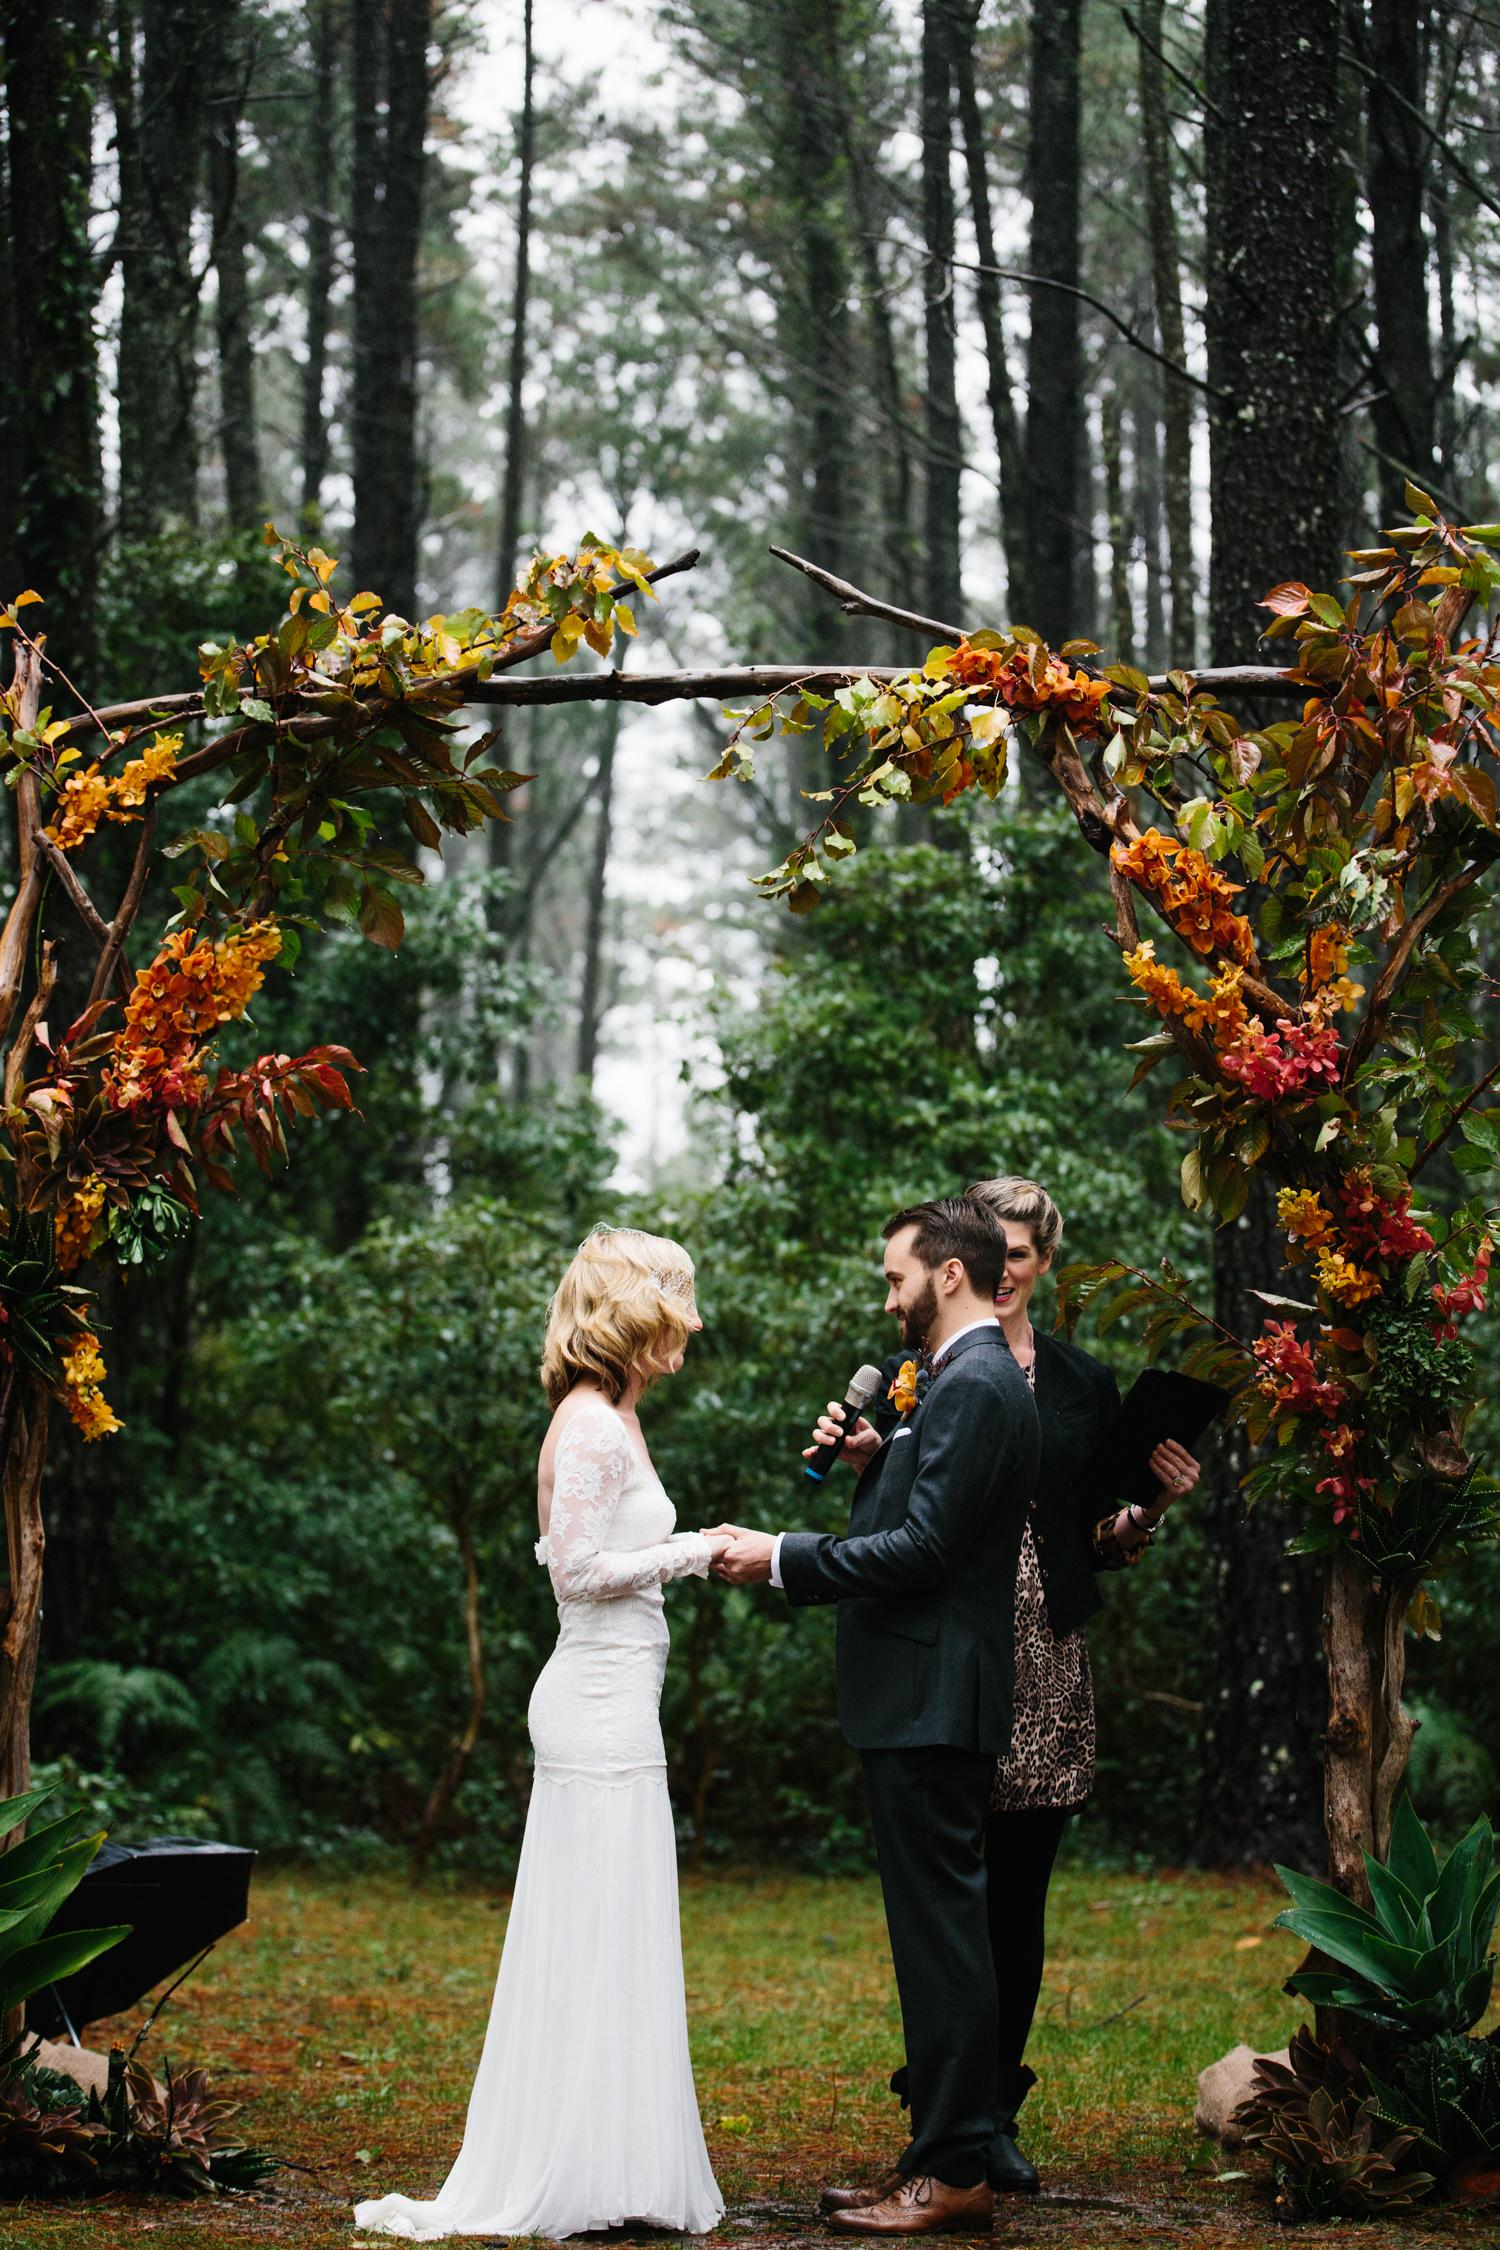 Lindsay-Nick-bilpin-pine-forrest-nsw-wedding-113